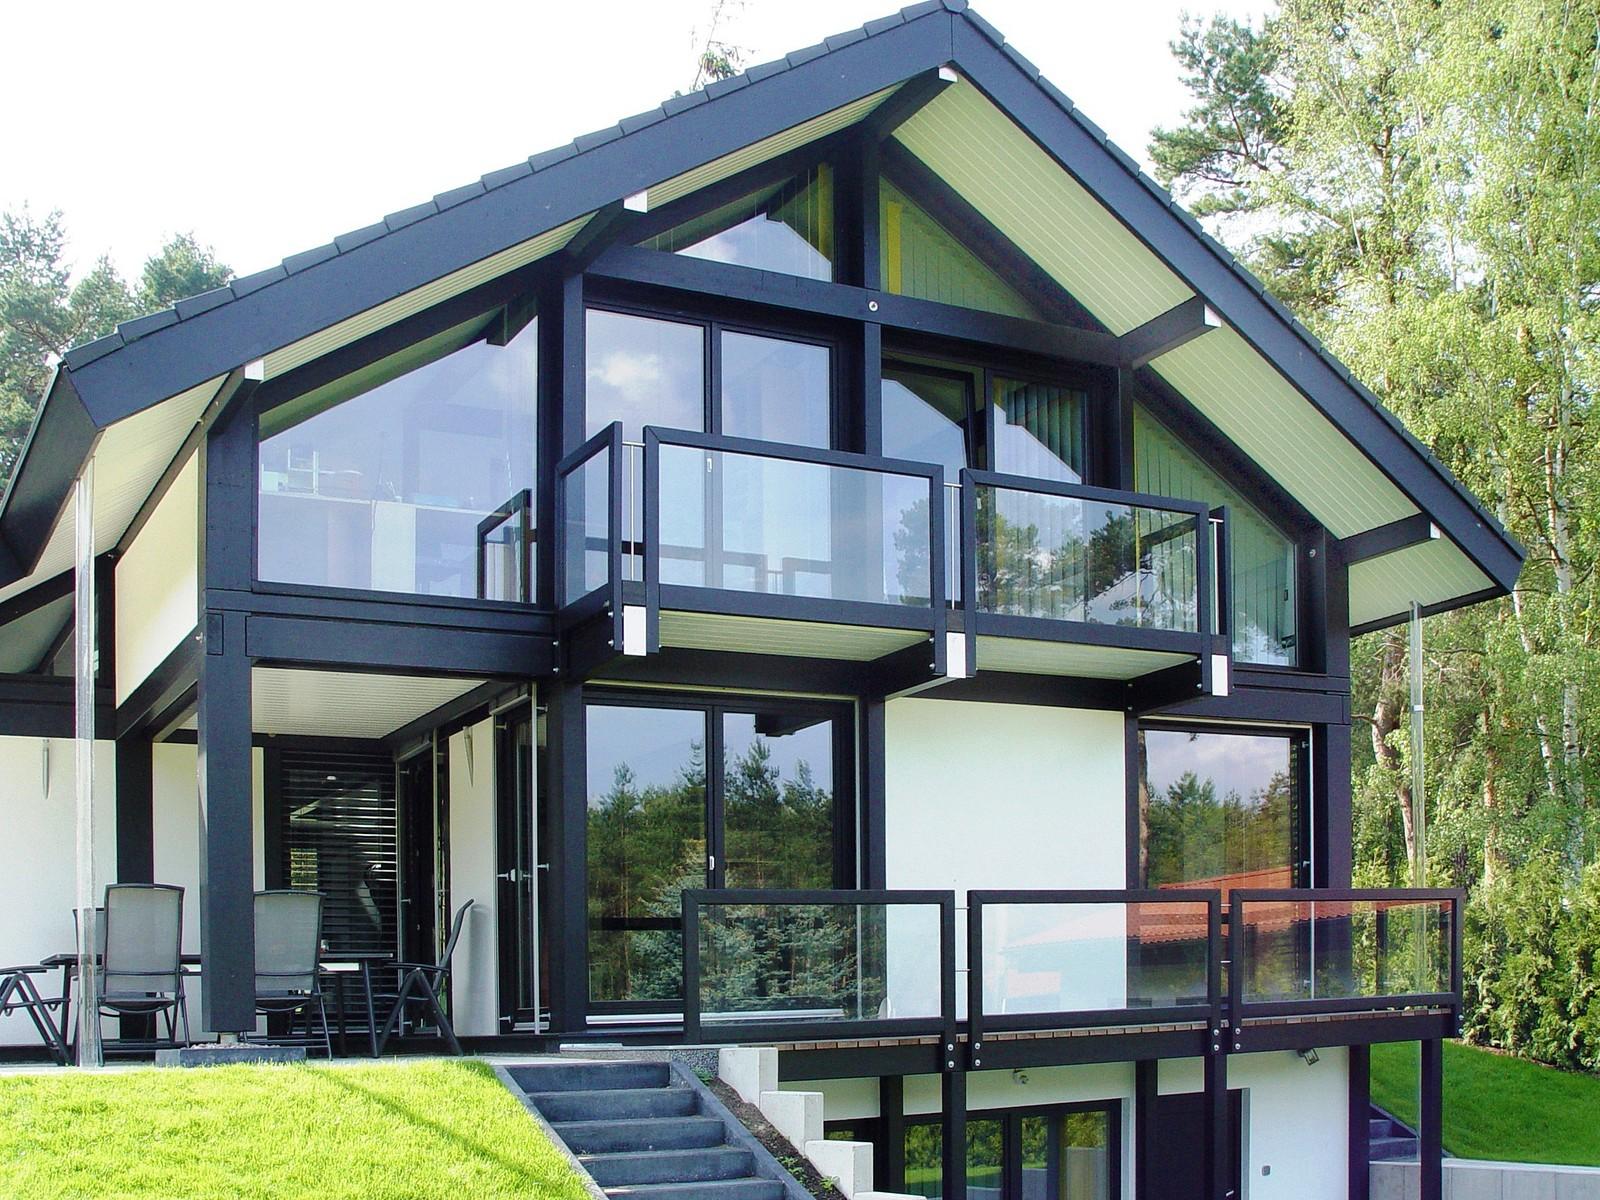 fachwerkhaus modern mit dunkler konstruktion und modernem. Black Bedroom Furniture Sets. Home Design Ideas